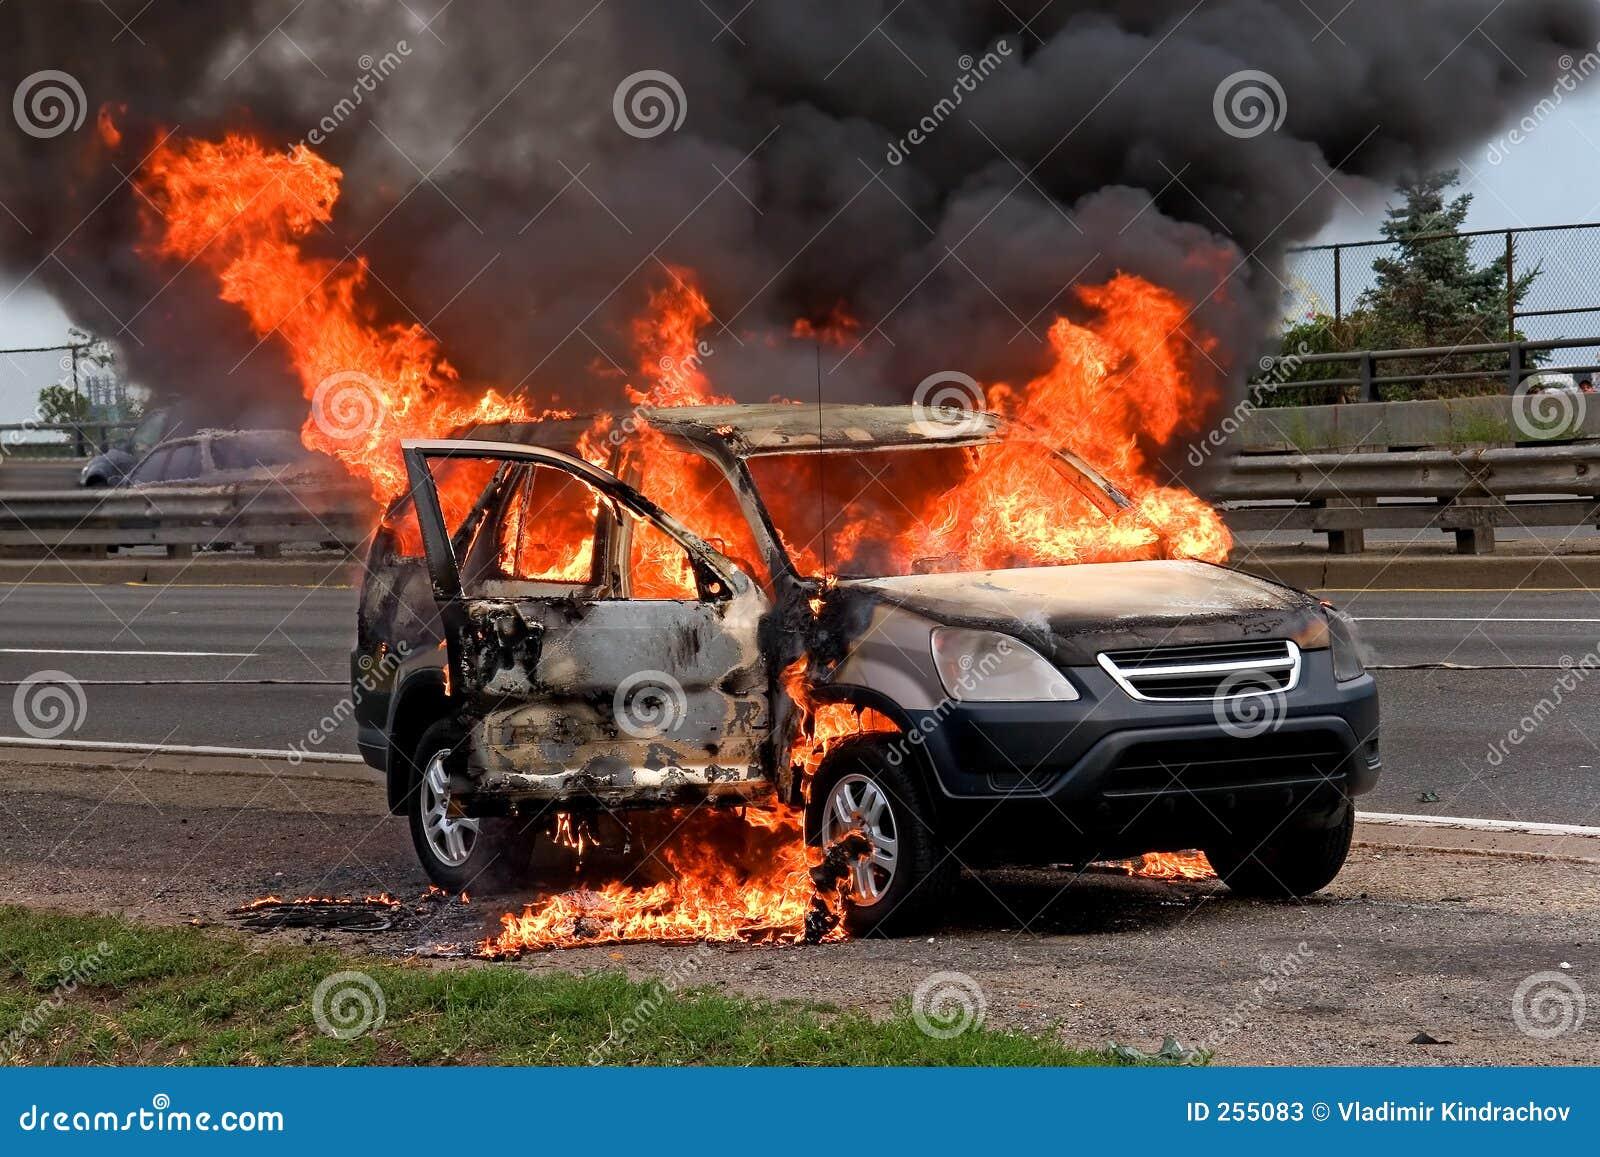 Fire burning car